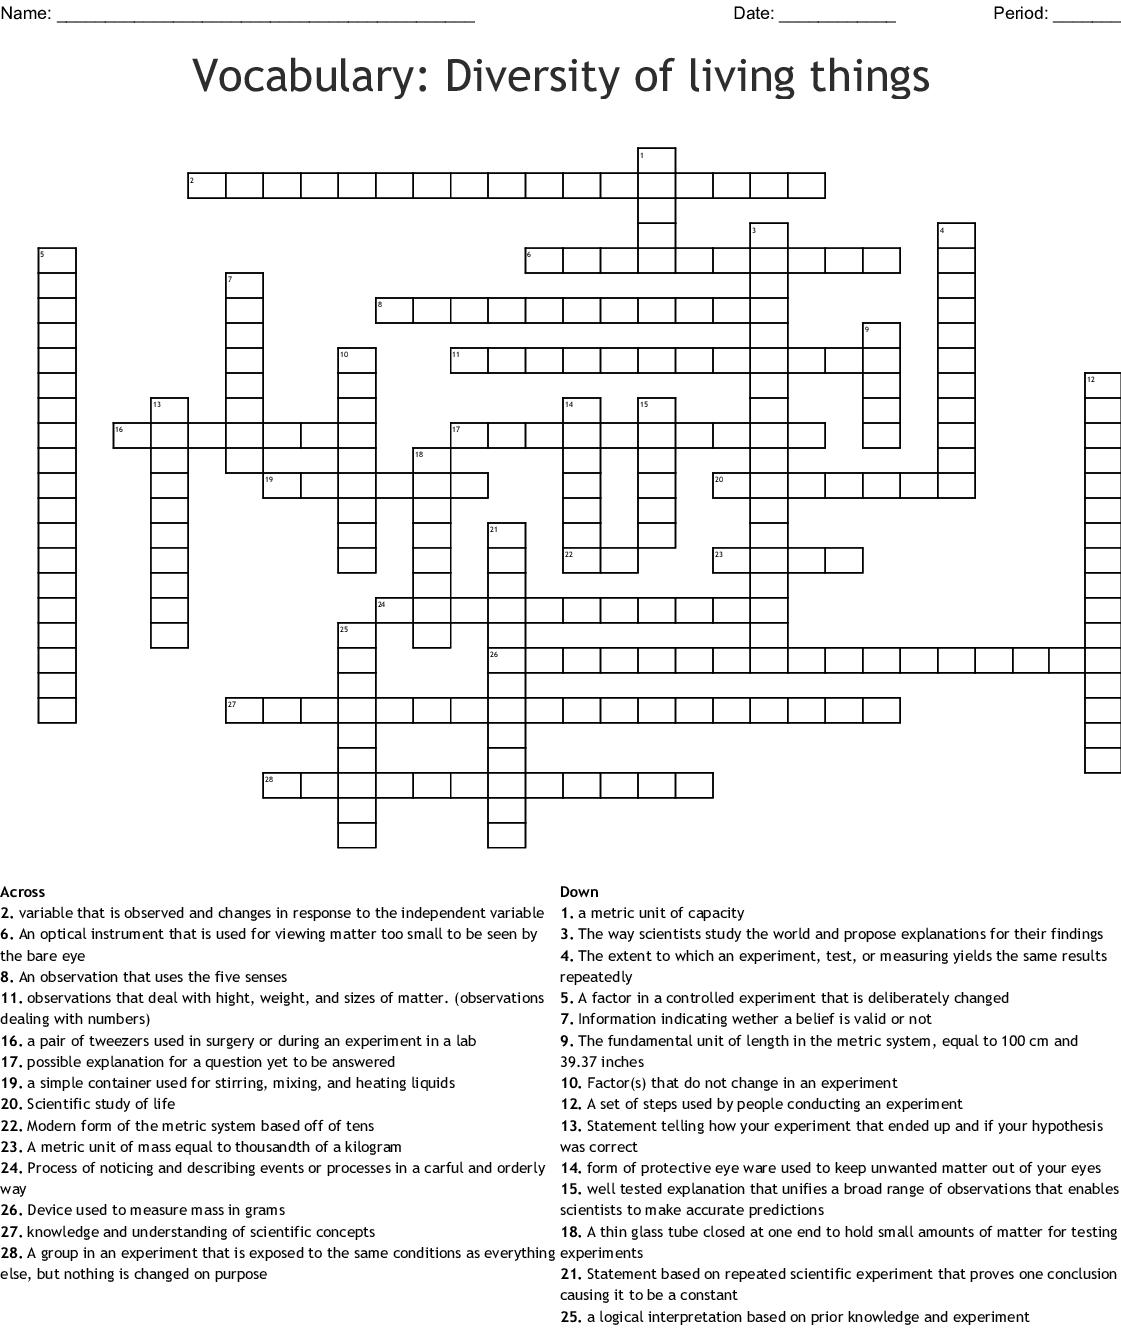 Vocabulary Diversity Of Living Things Crossword